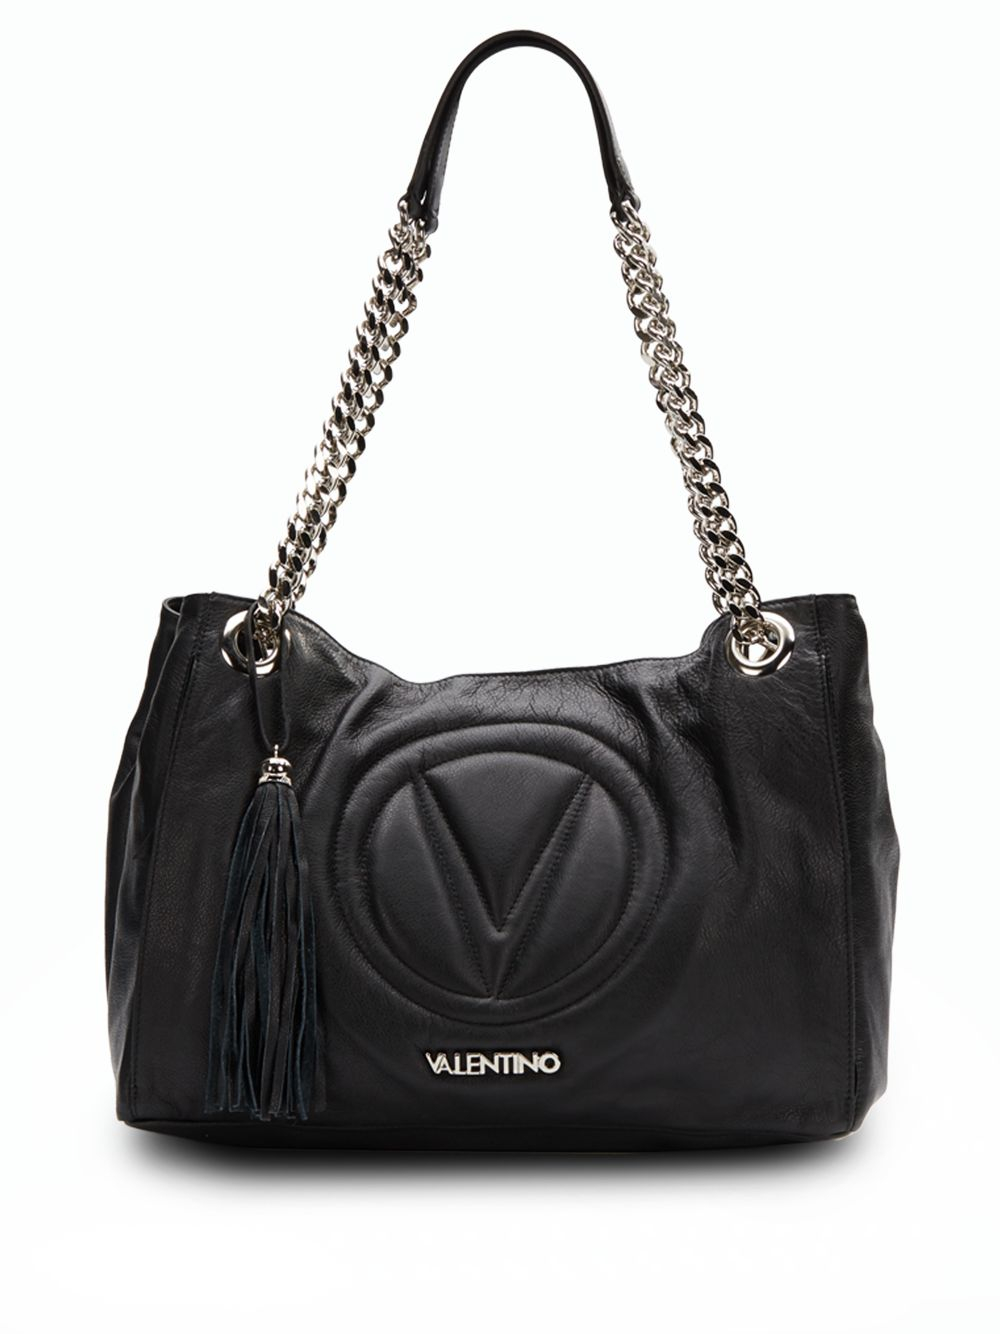 valentino by mario valentino verra leather shoulder bag in. Black Bedroom Furniture Sets. Home Design Ideas